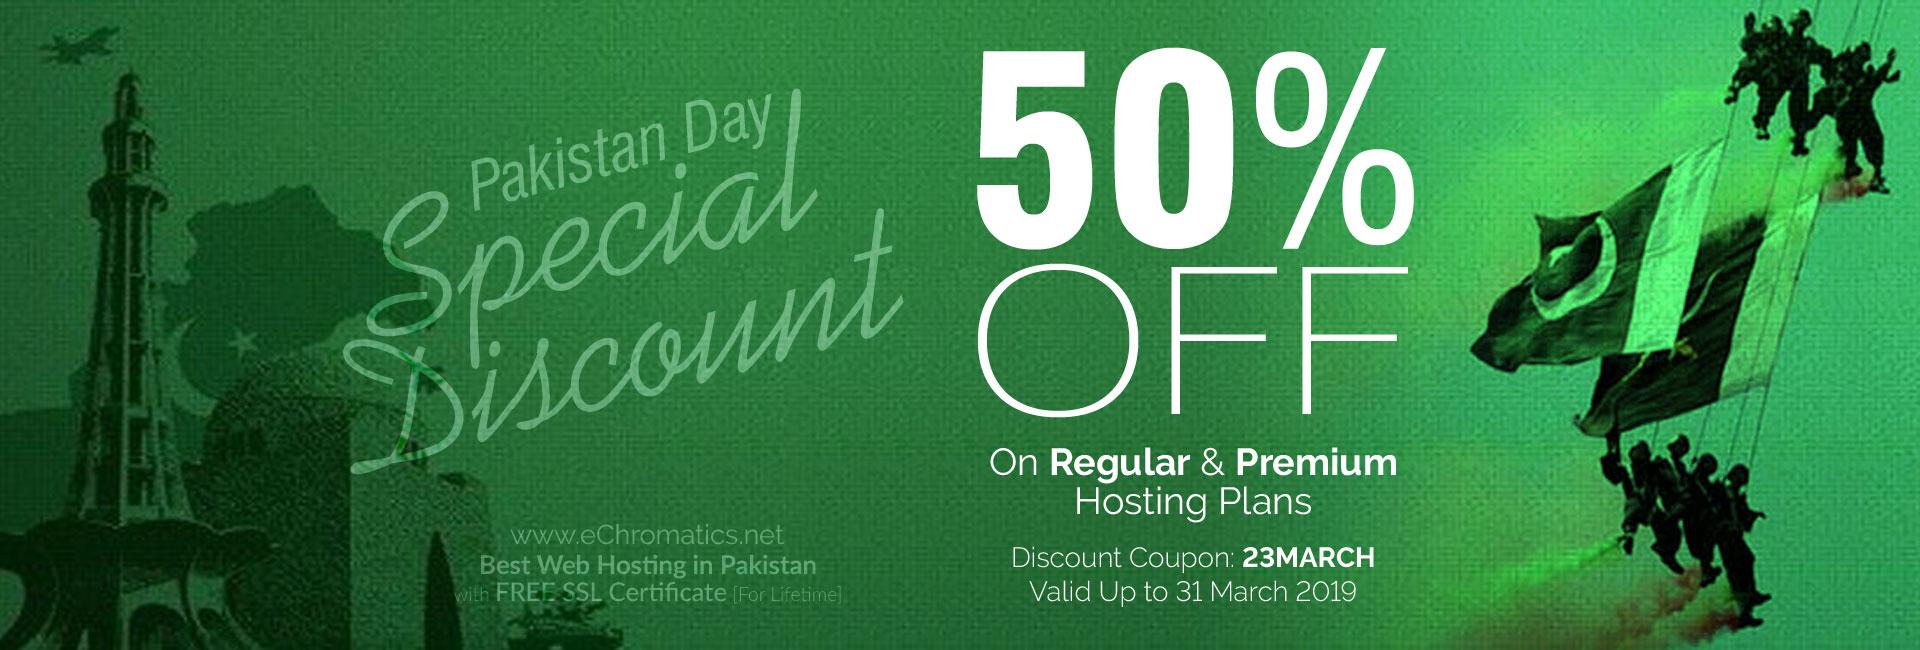 Special 50% OFF on Regular & Premium Web Hosting Plans eChromatics Web Solutions 23 March 2019